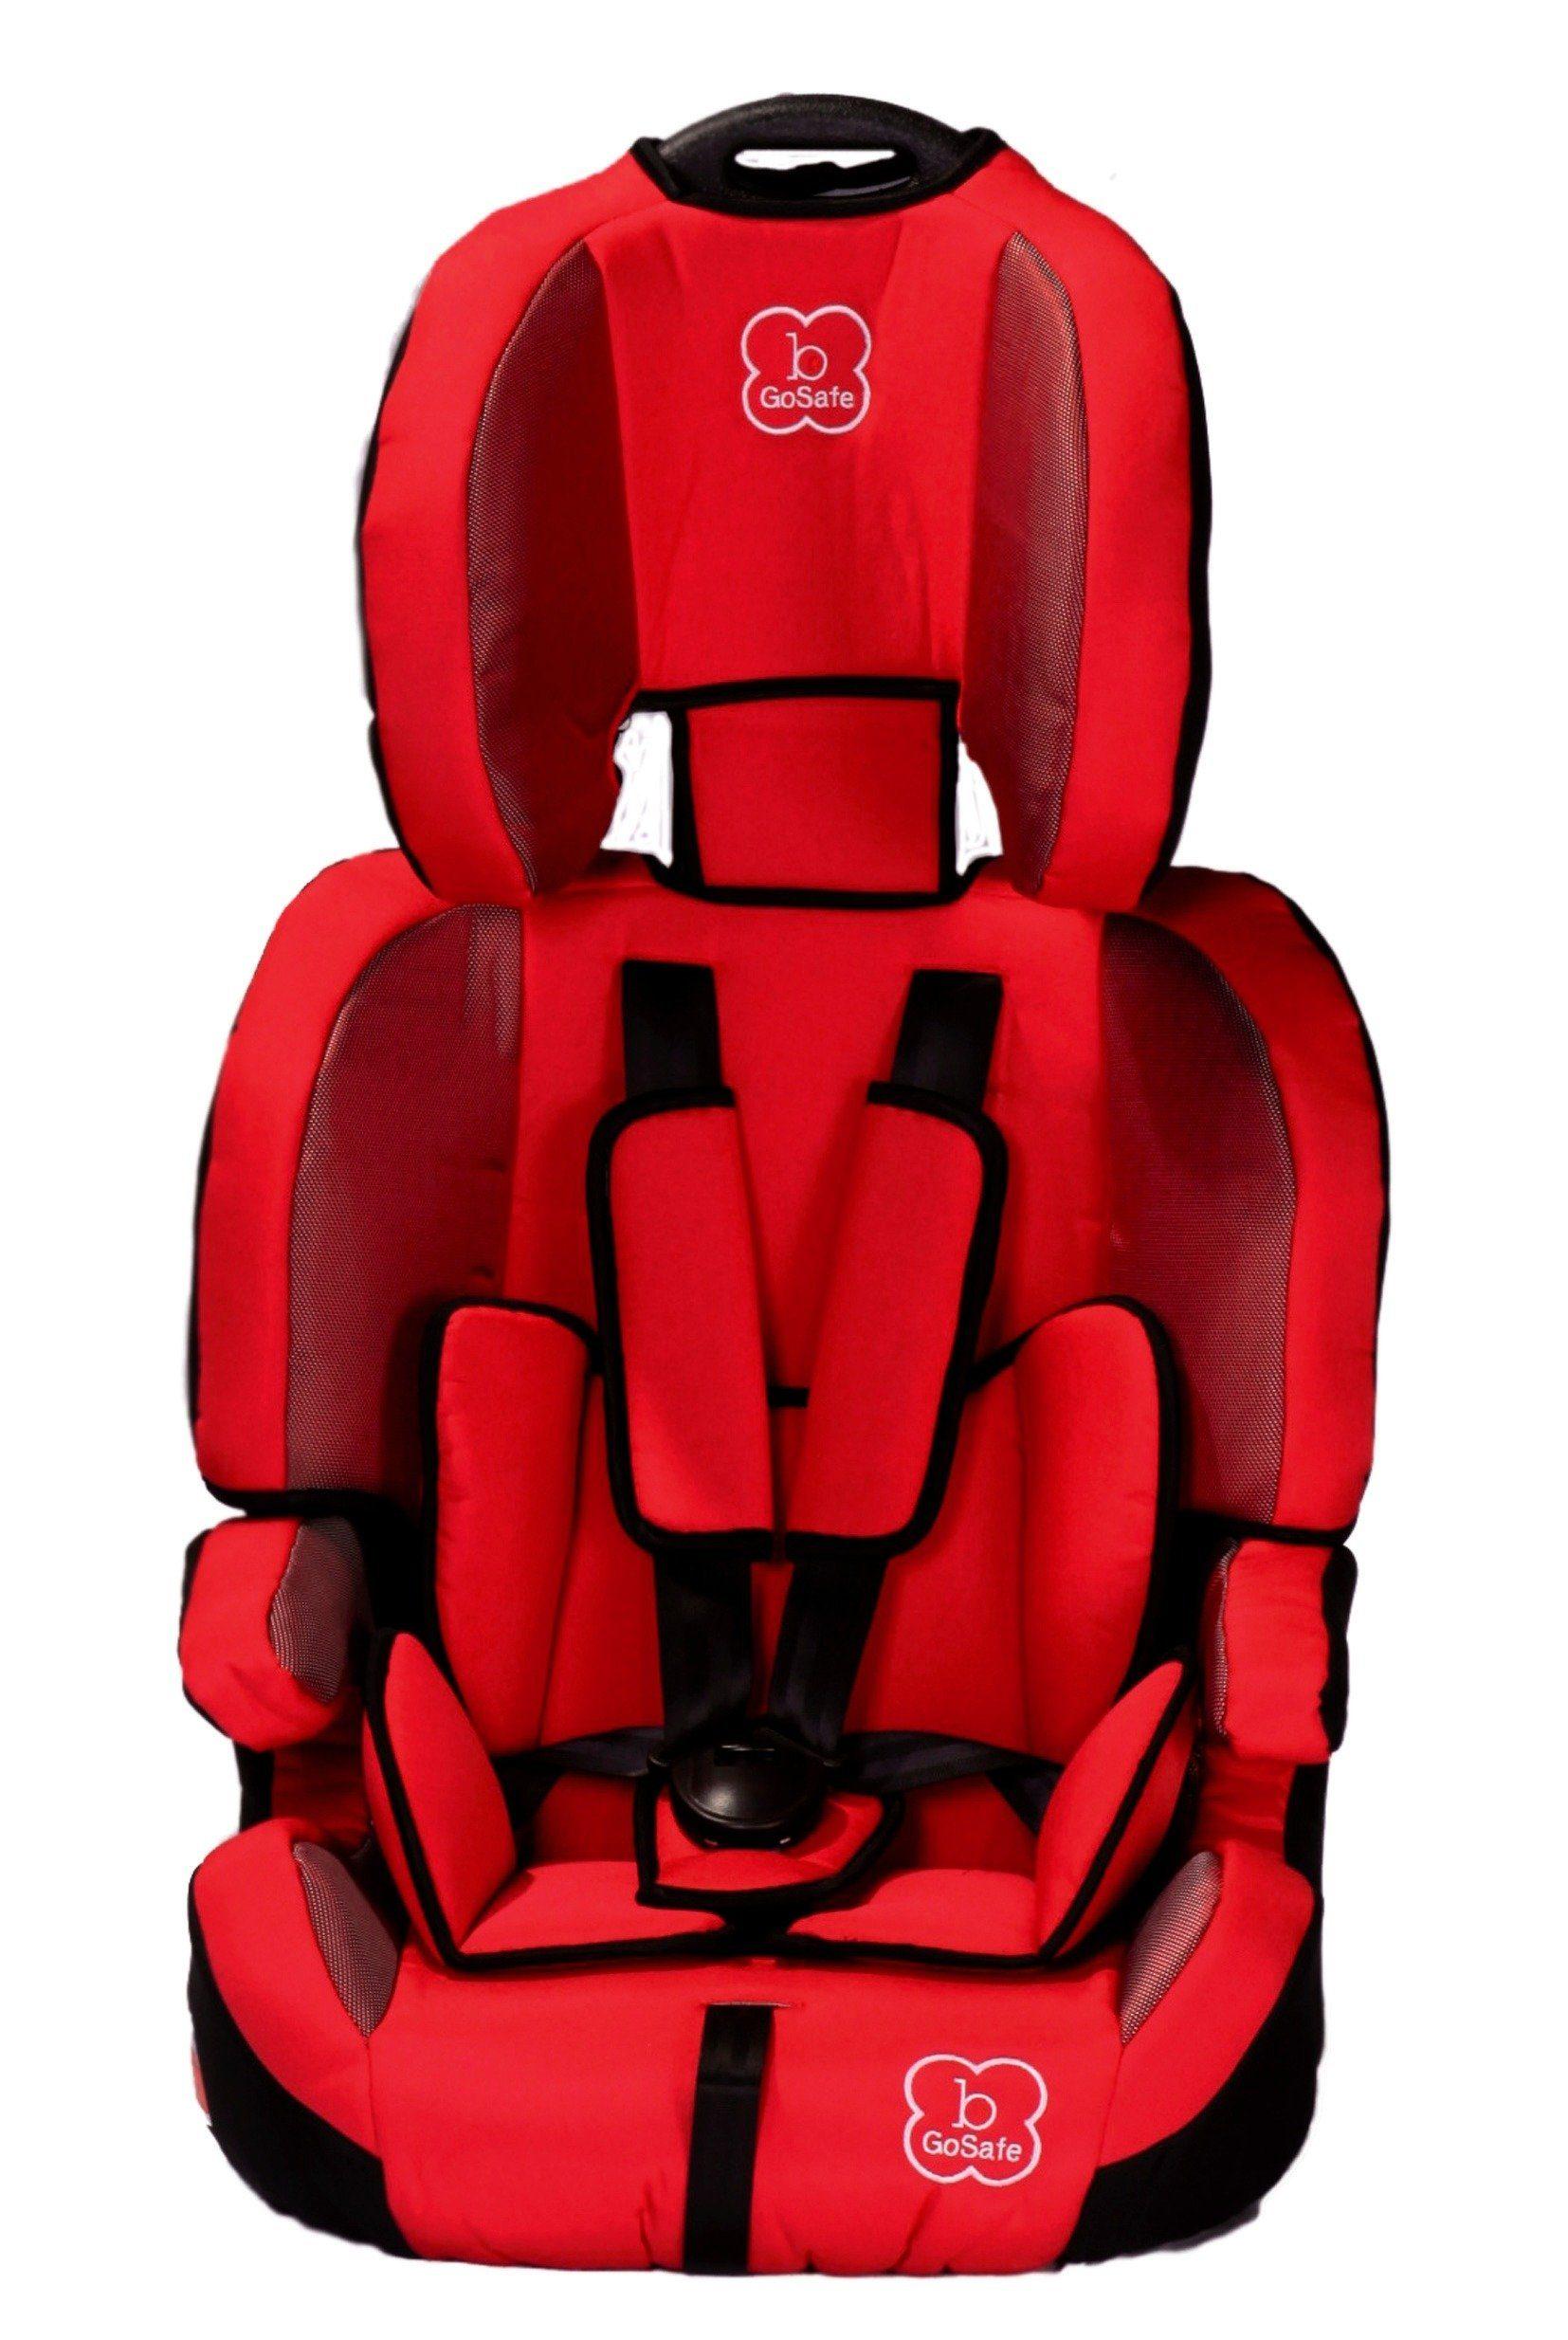 BABYGO Kindersitz »GoSafe«, 9 - 36 kg